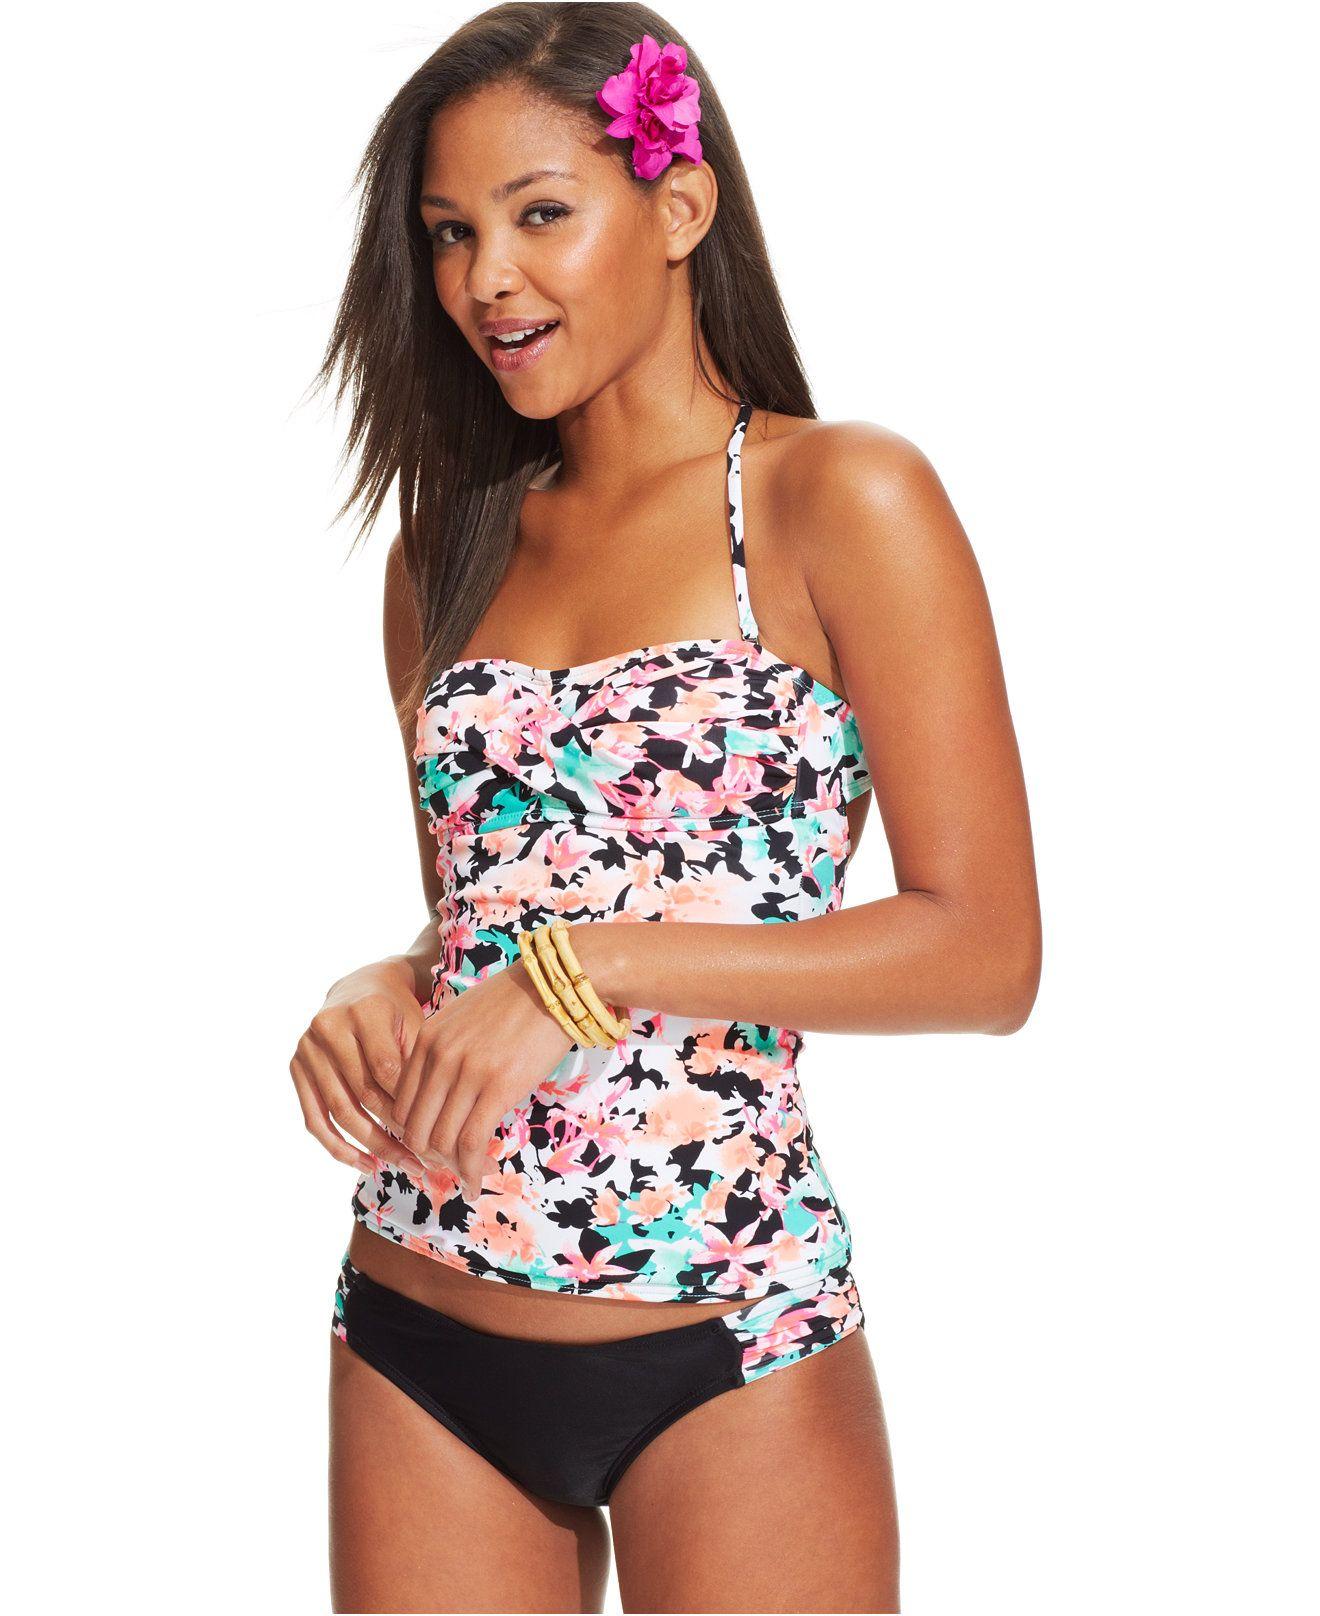 7816ecb69f403 Hobie Floral-Print Twist-Front Tankini & Printed-Tab Hipster Bottom - Juniors  Swimwear - Macy's